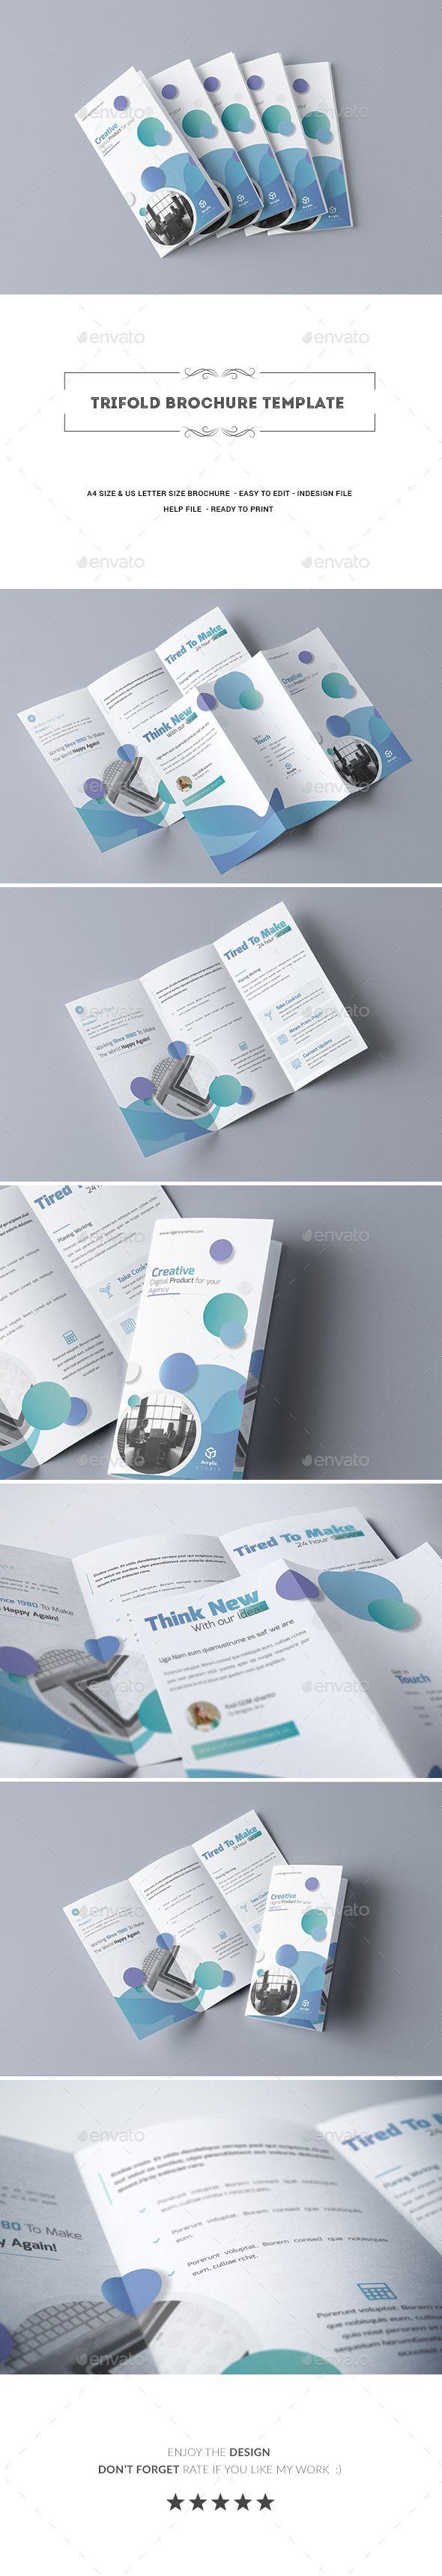 trifold brochure template pinterest brochure template corporate